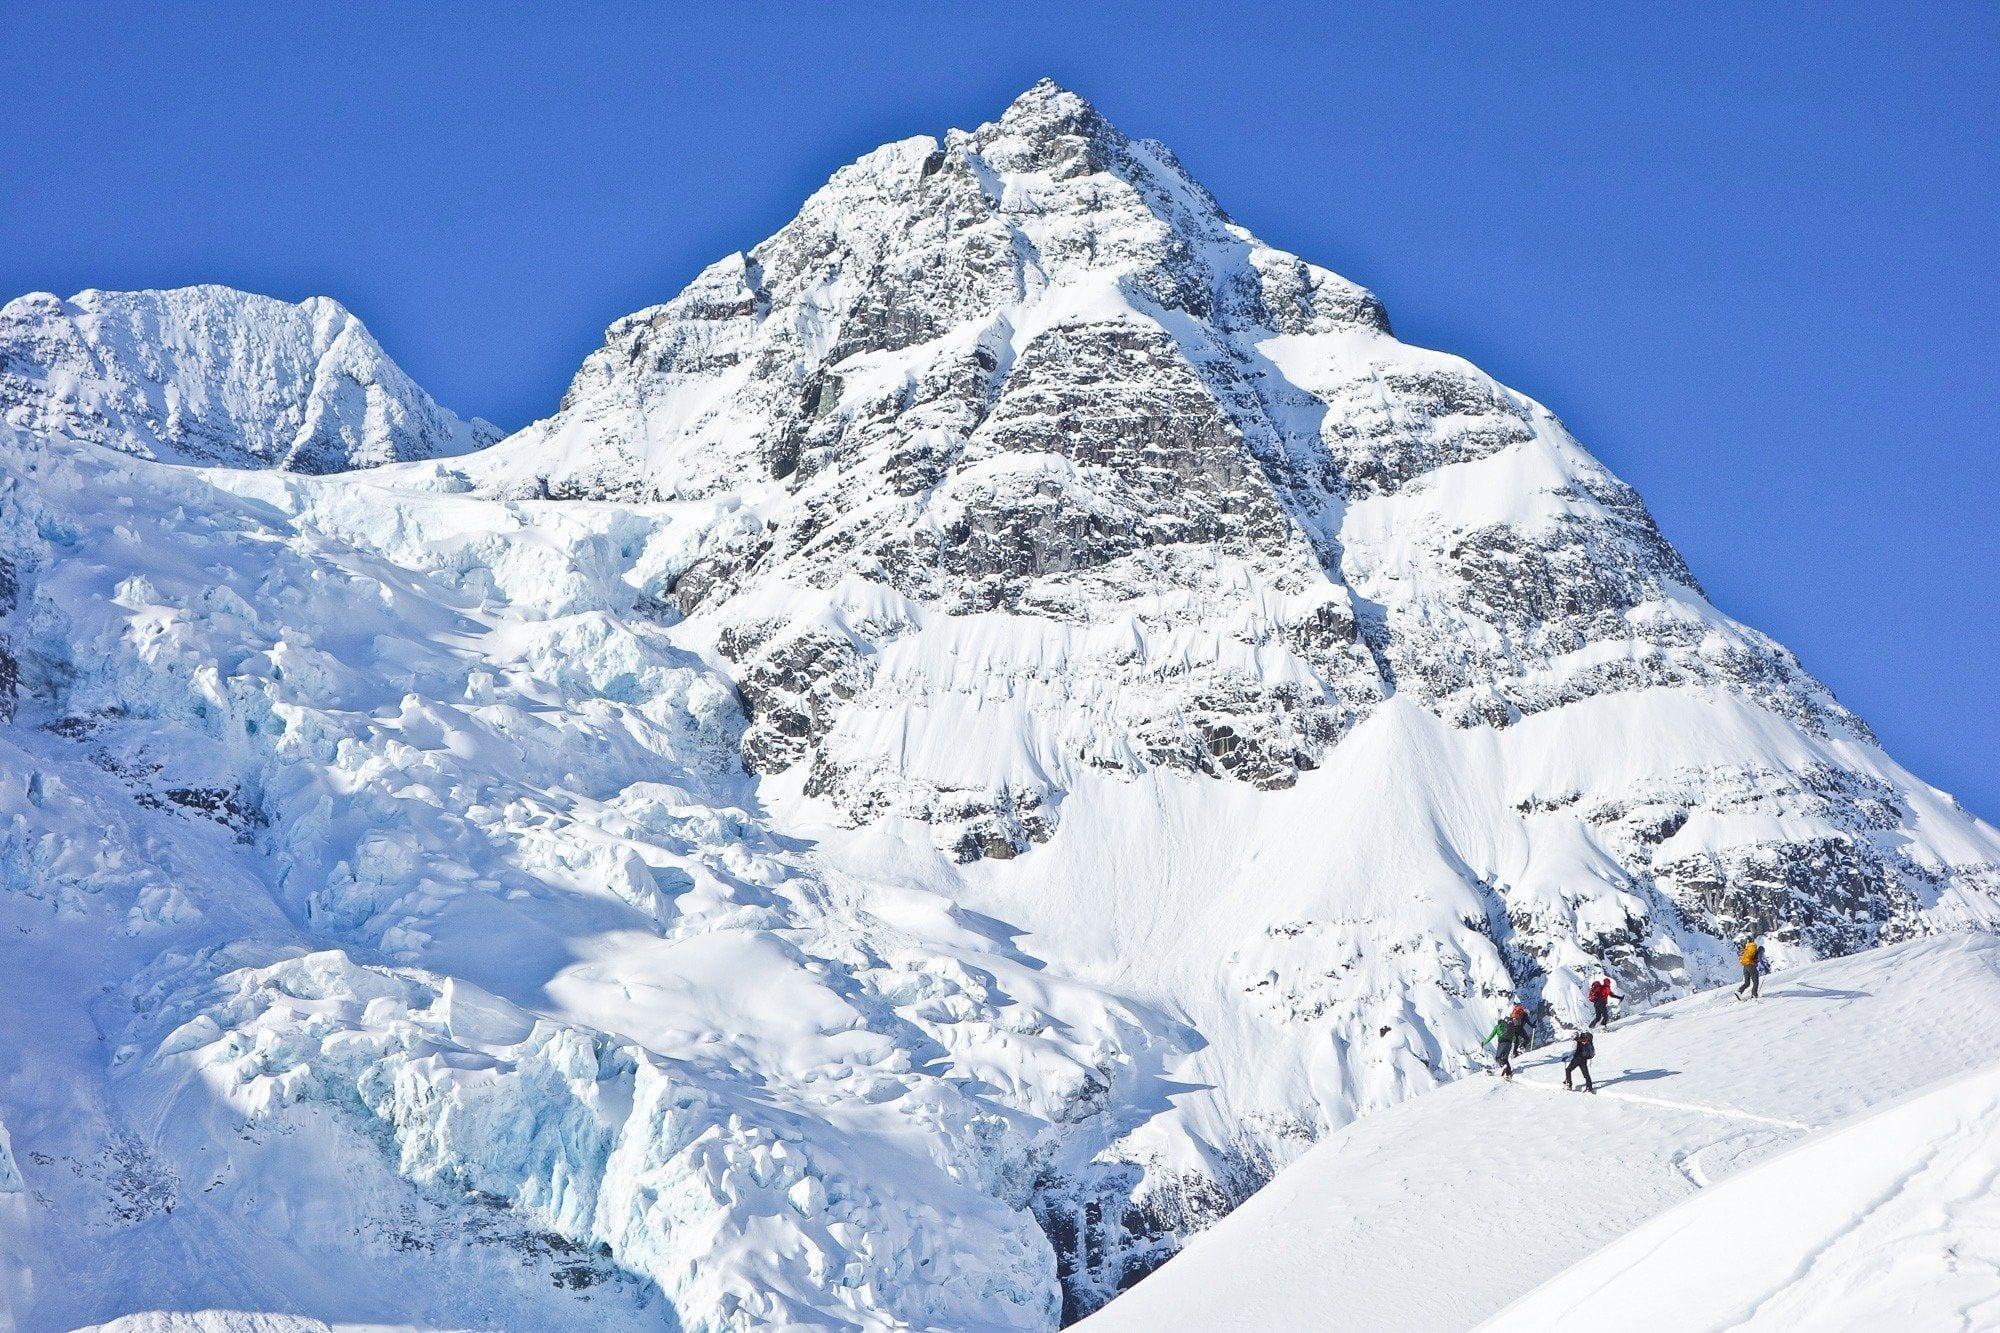 Sawback Alpine Adventures